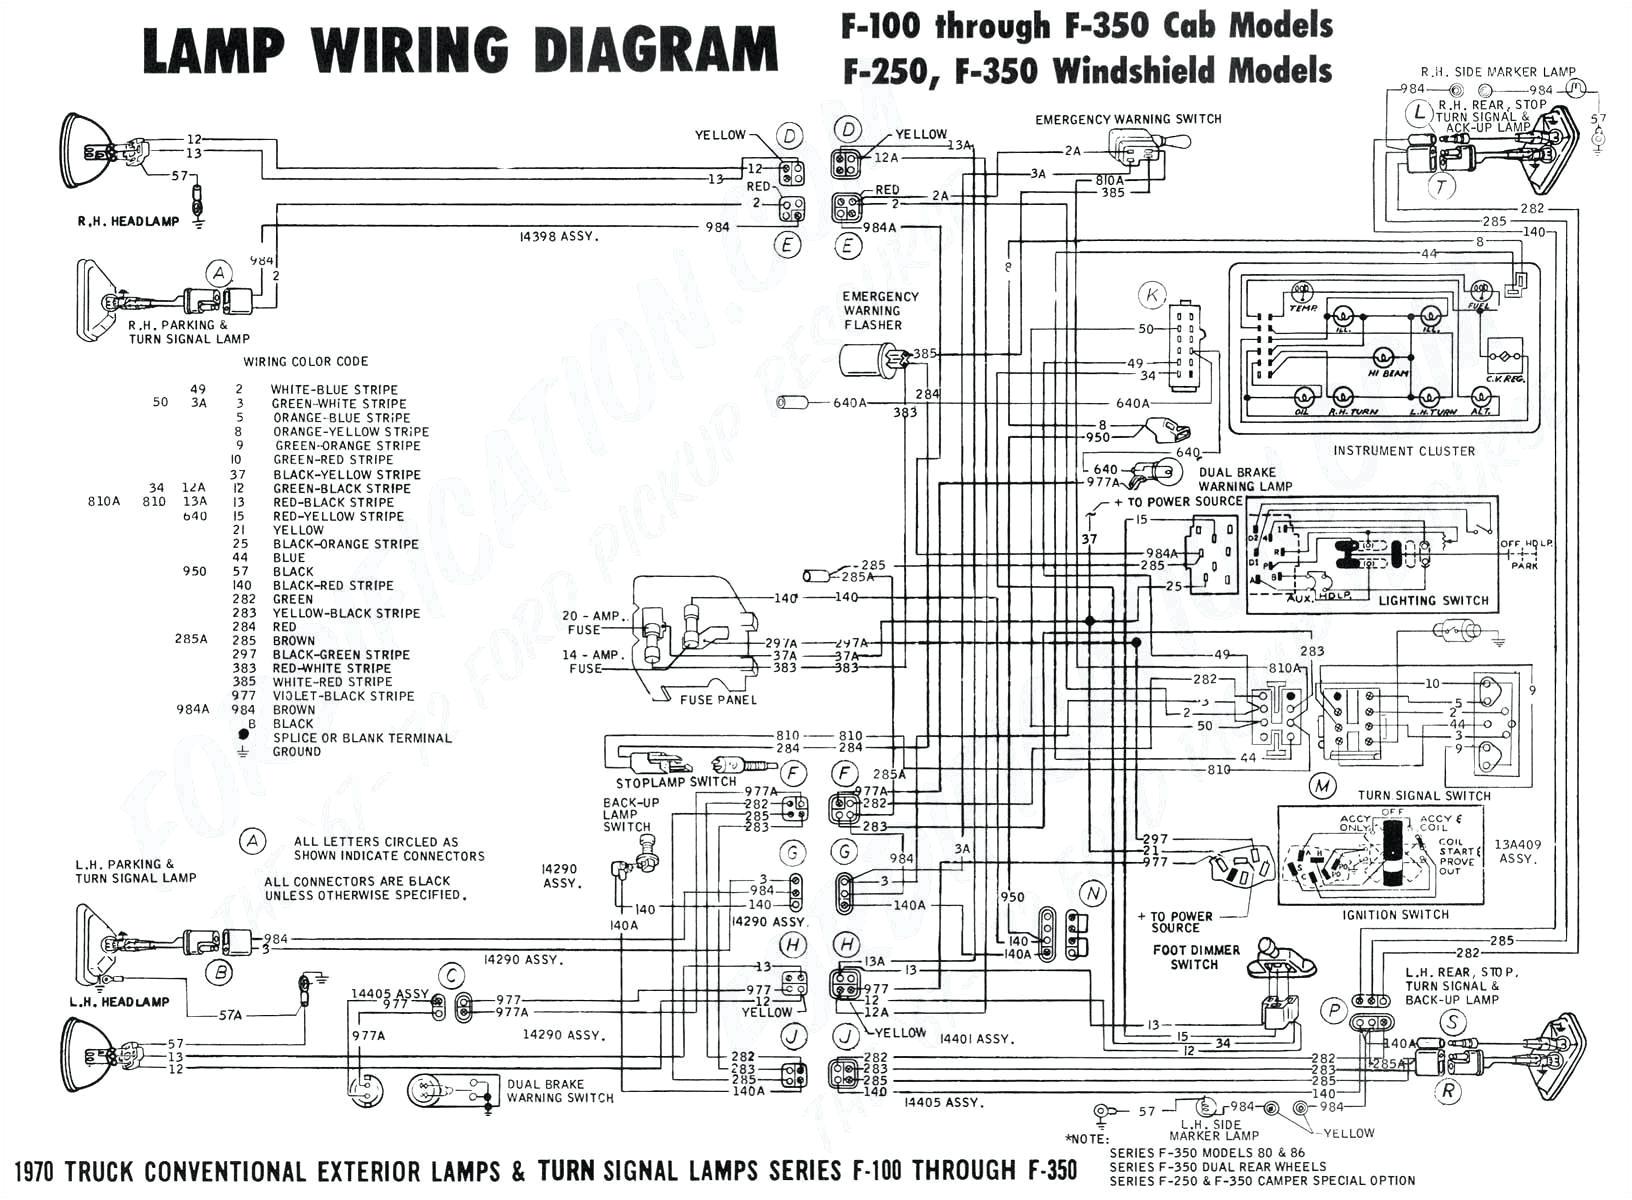 wiring diagram of 4 9 cadillac wiring diagram expert switch box wiring diagram 9